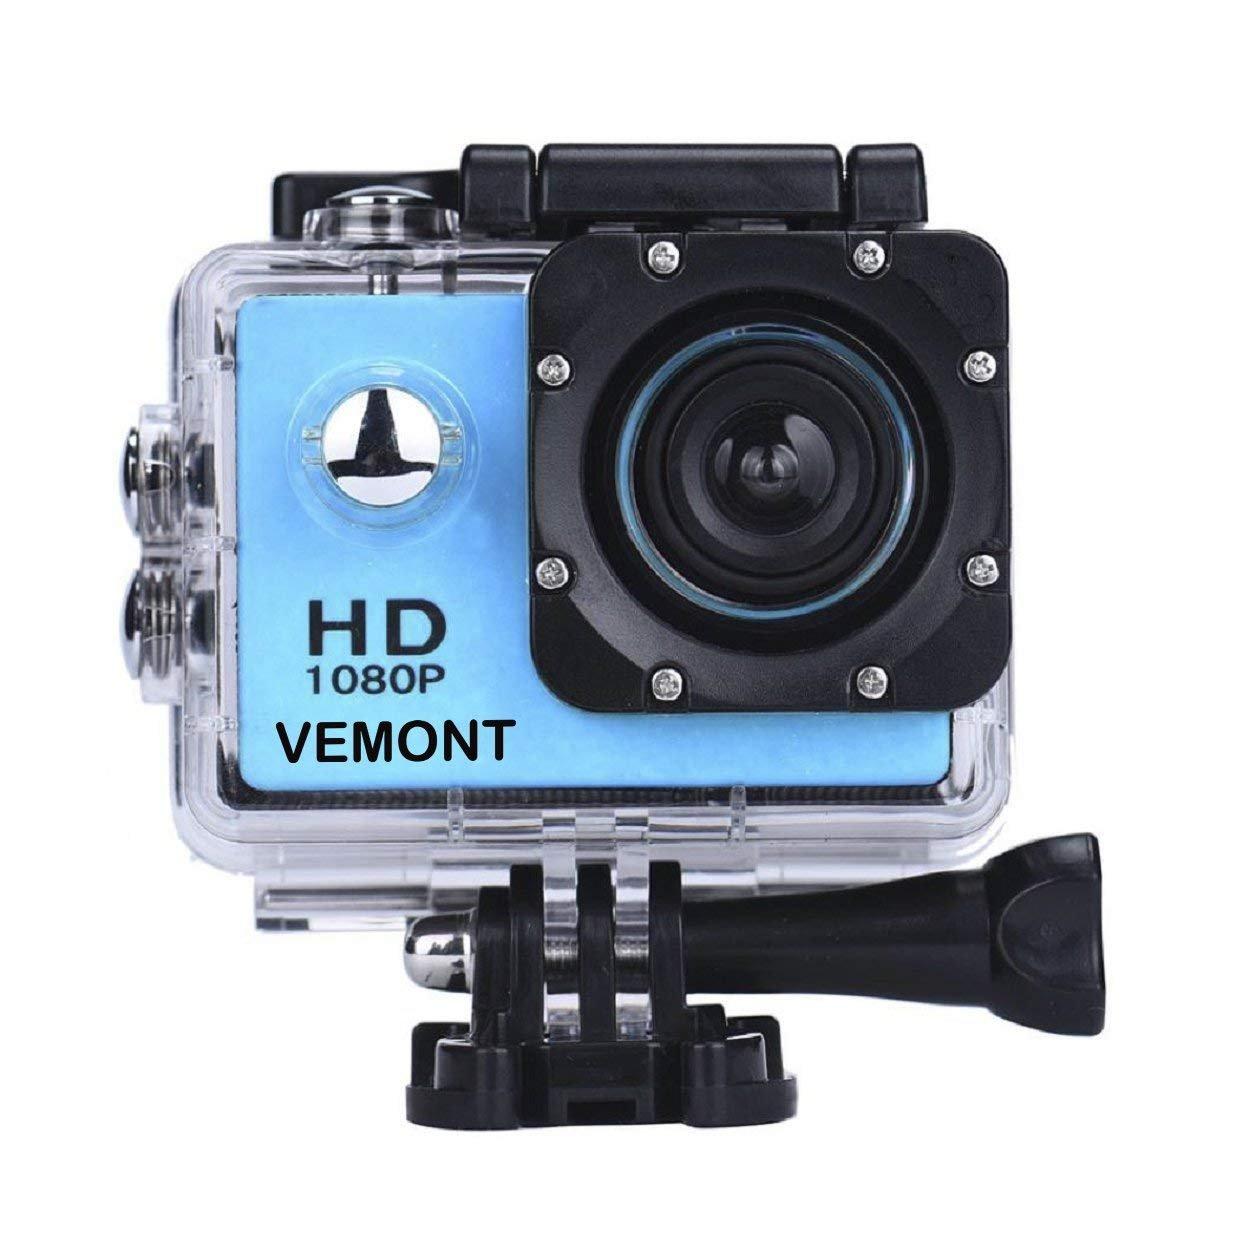 Vemont Underwater Waterproof Mounting Accessories